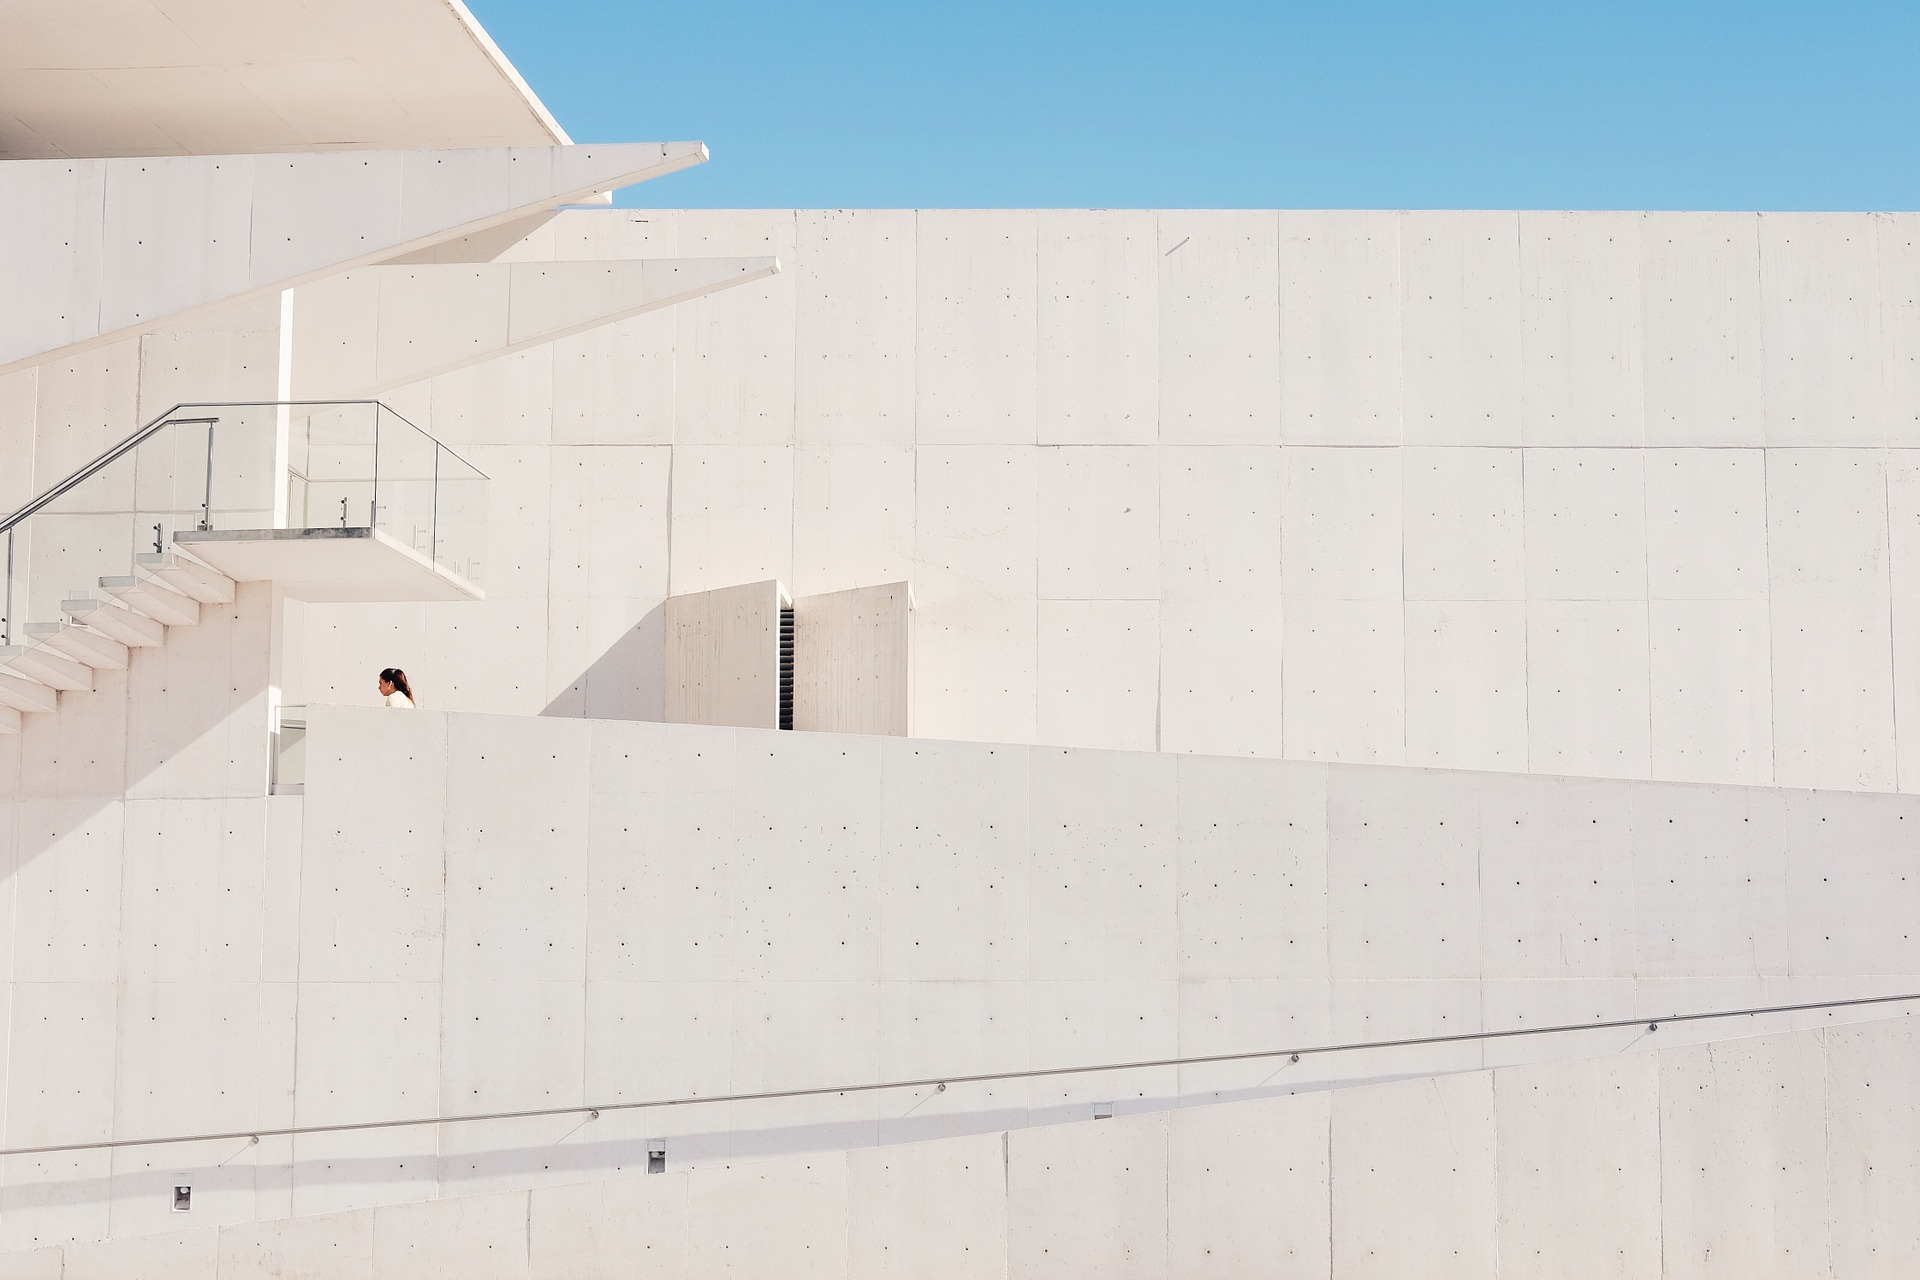 building-1246260_1920.jpg